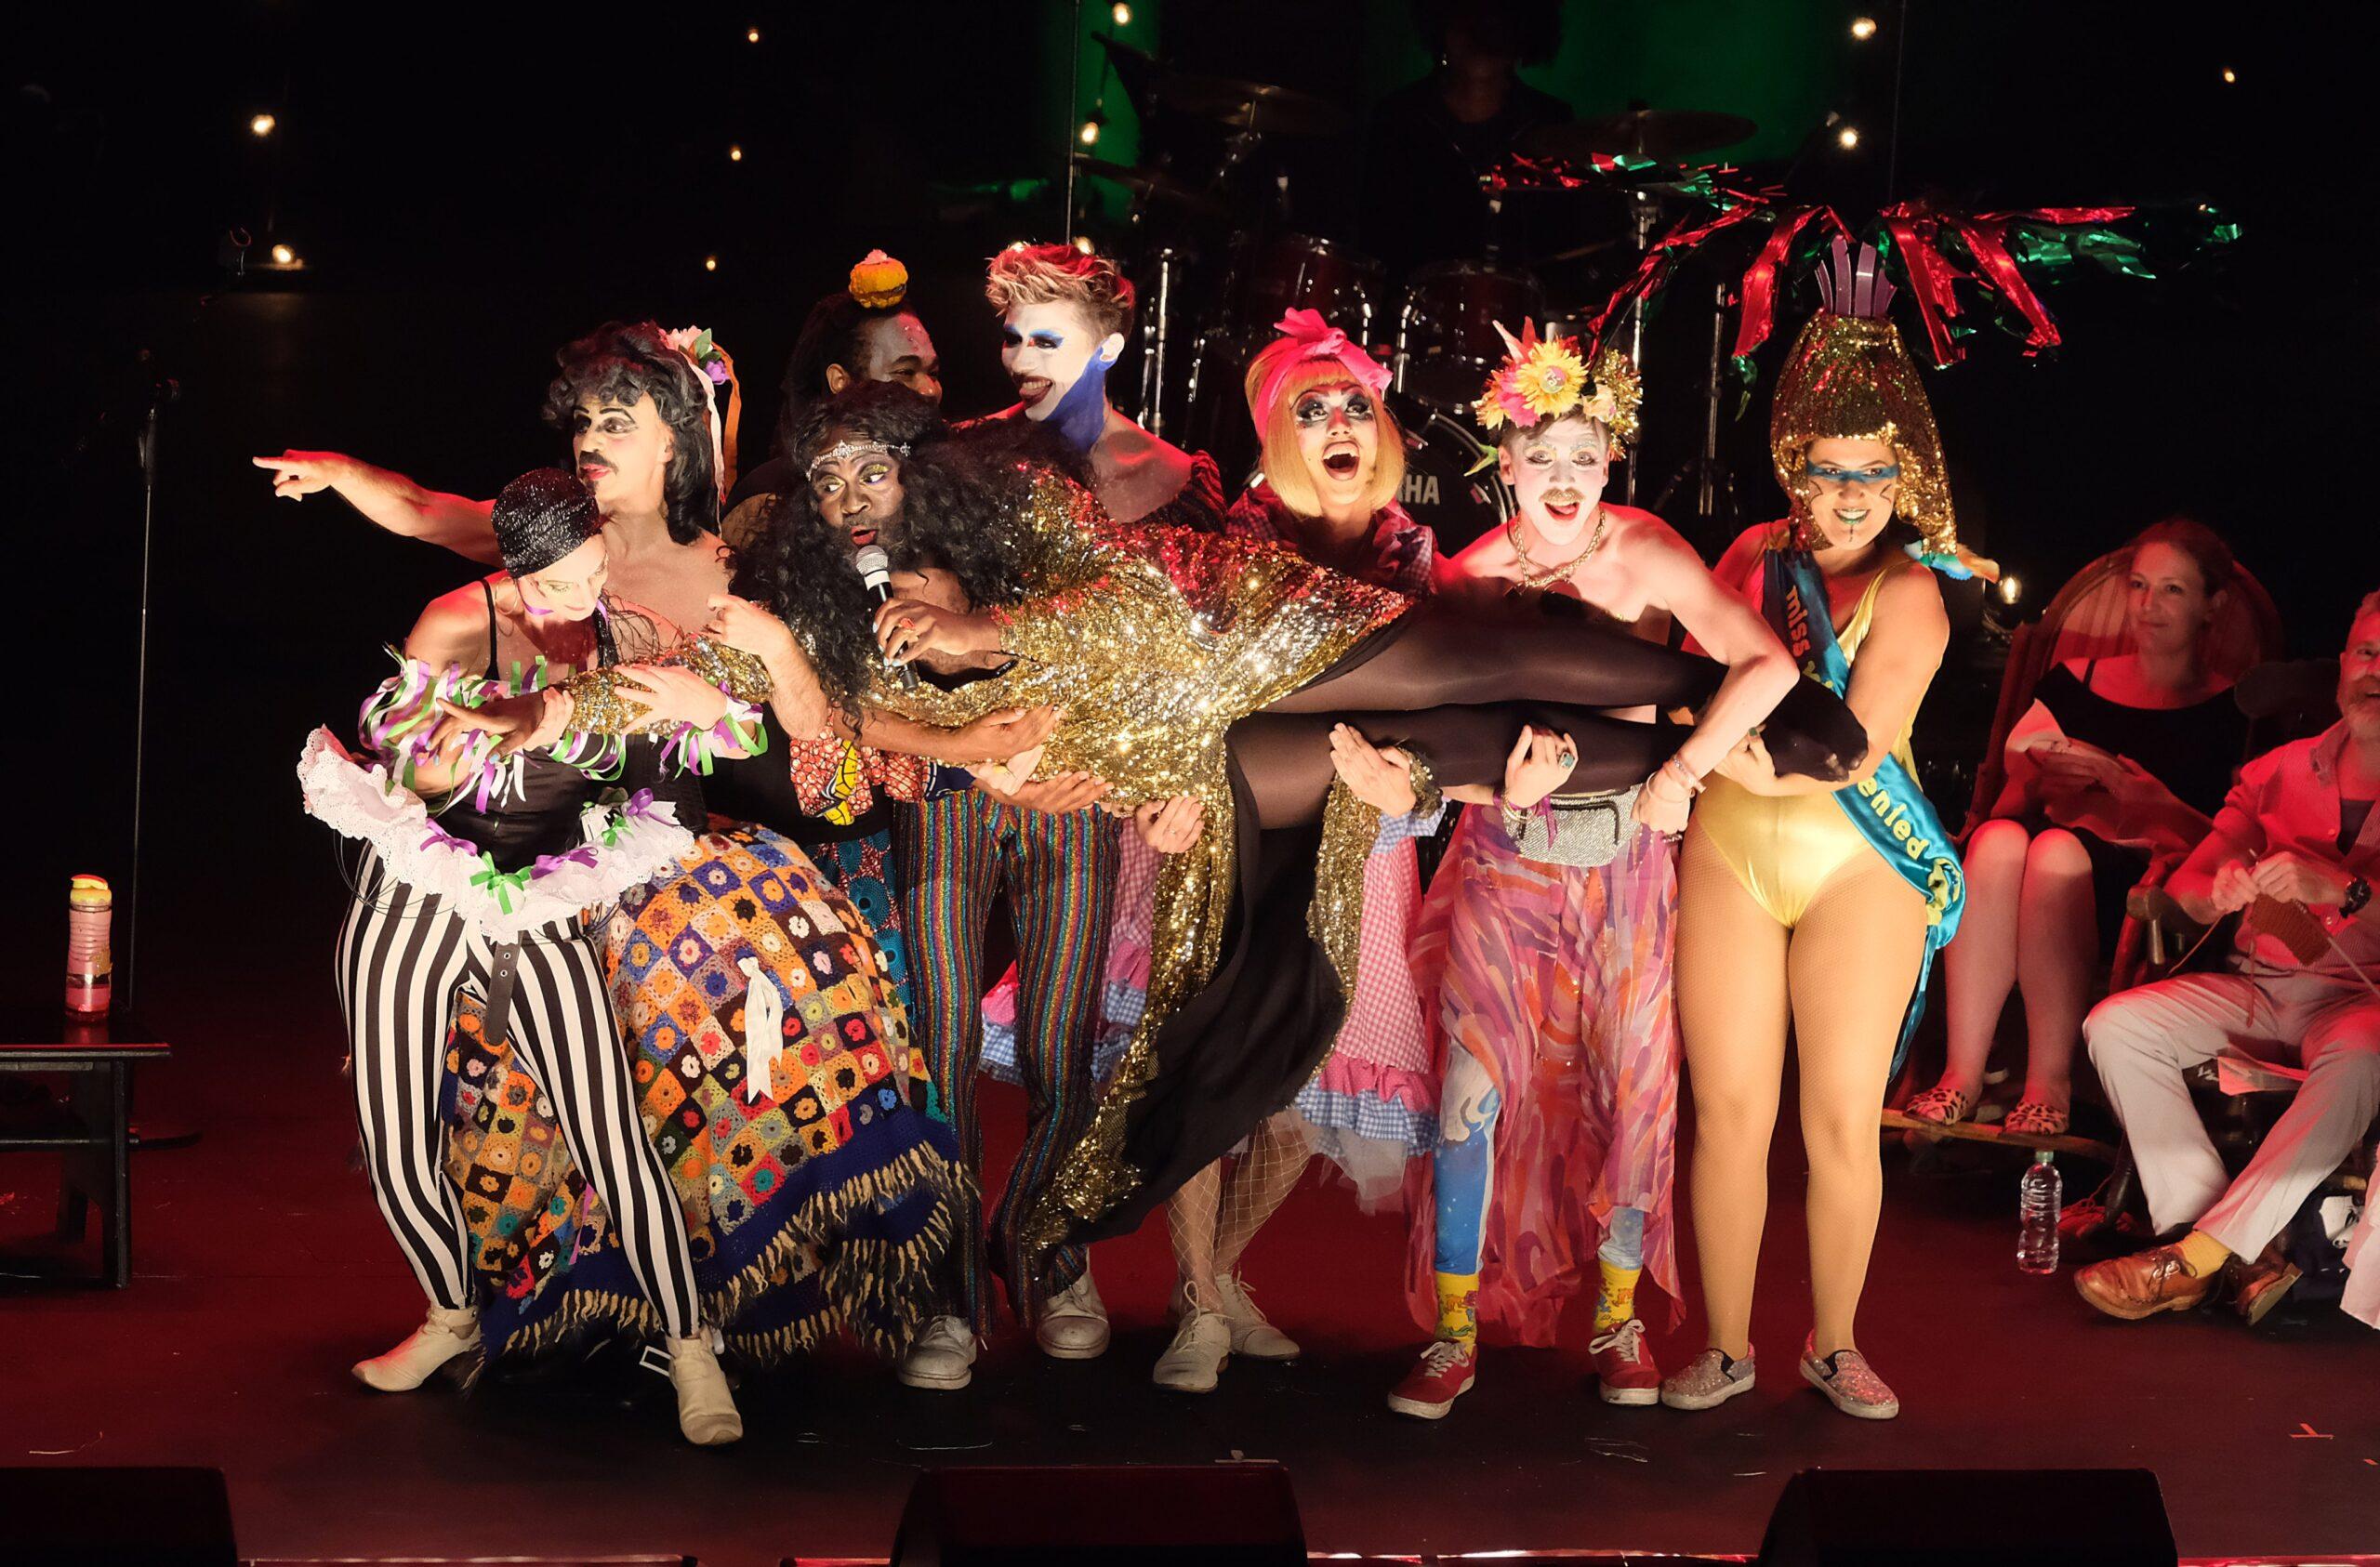 LGC Taylor Mac Barbican Cred.@LIFTfestival